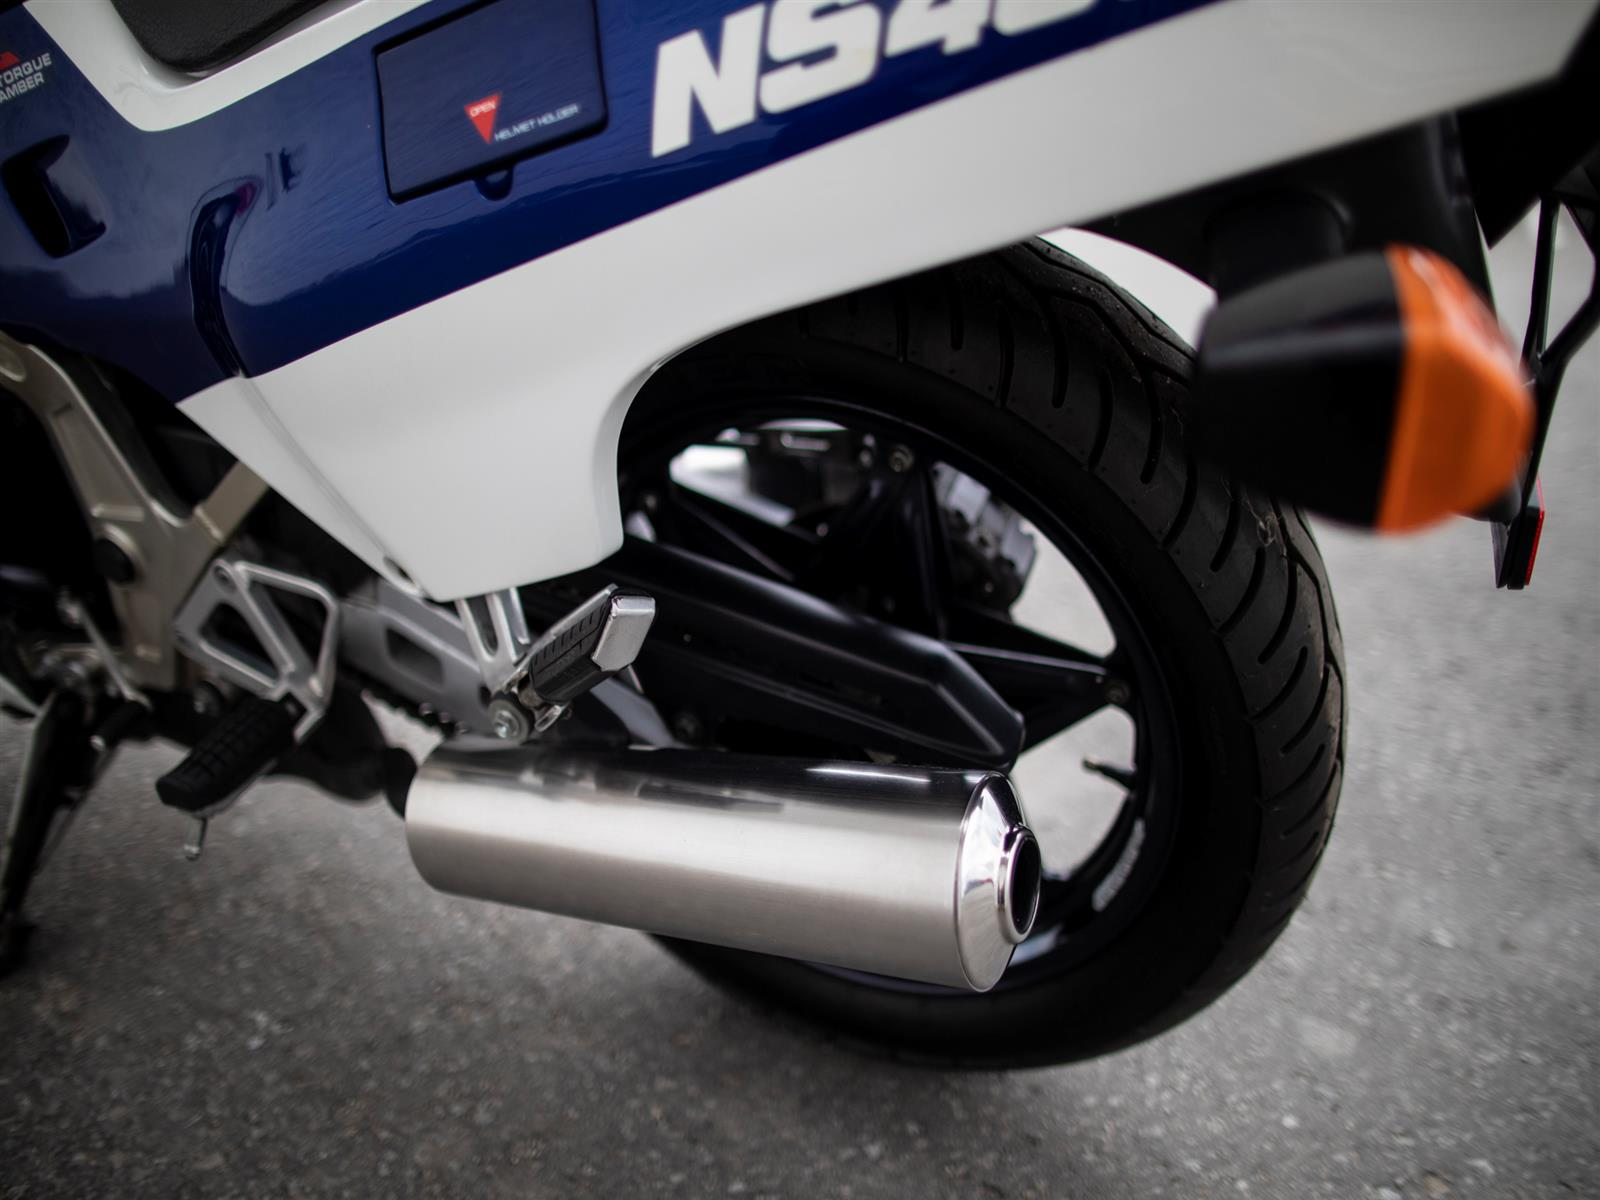 1986 Honda NSR NSR 400R